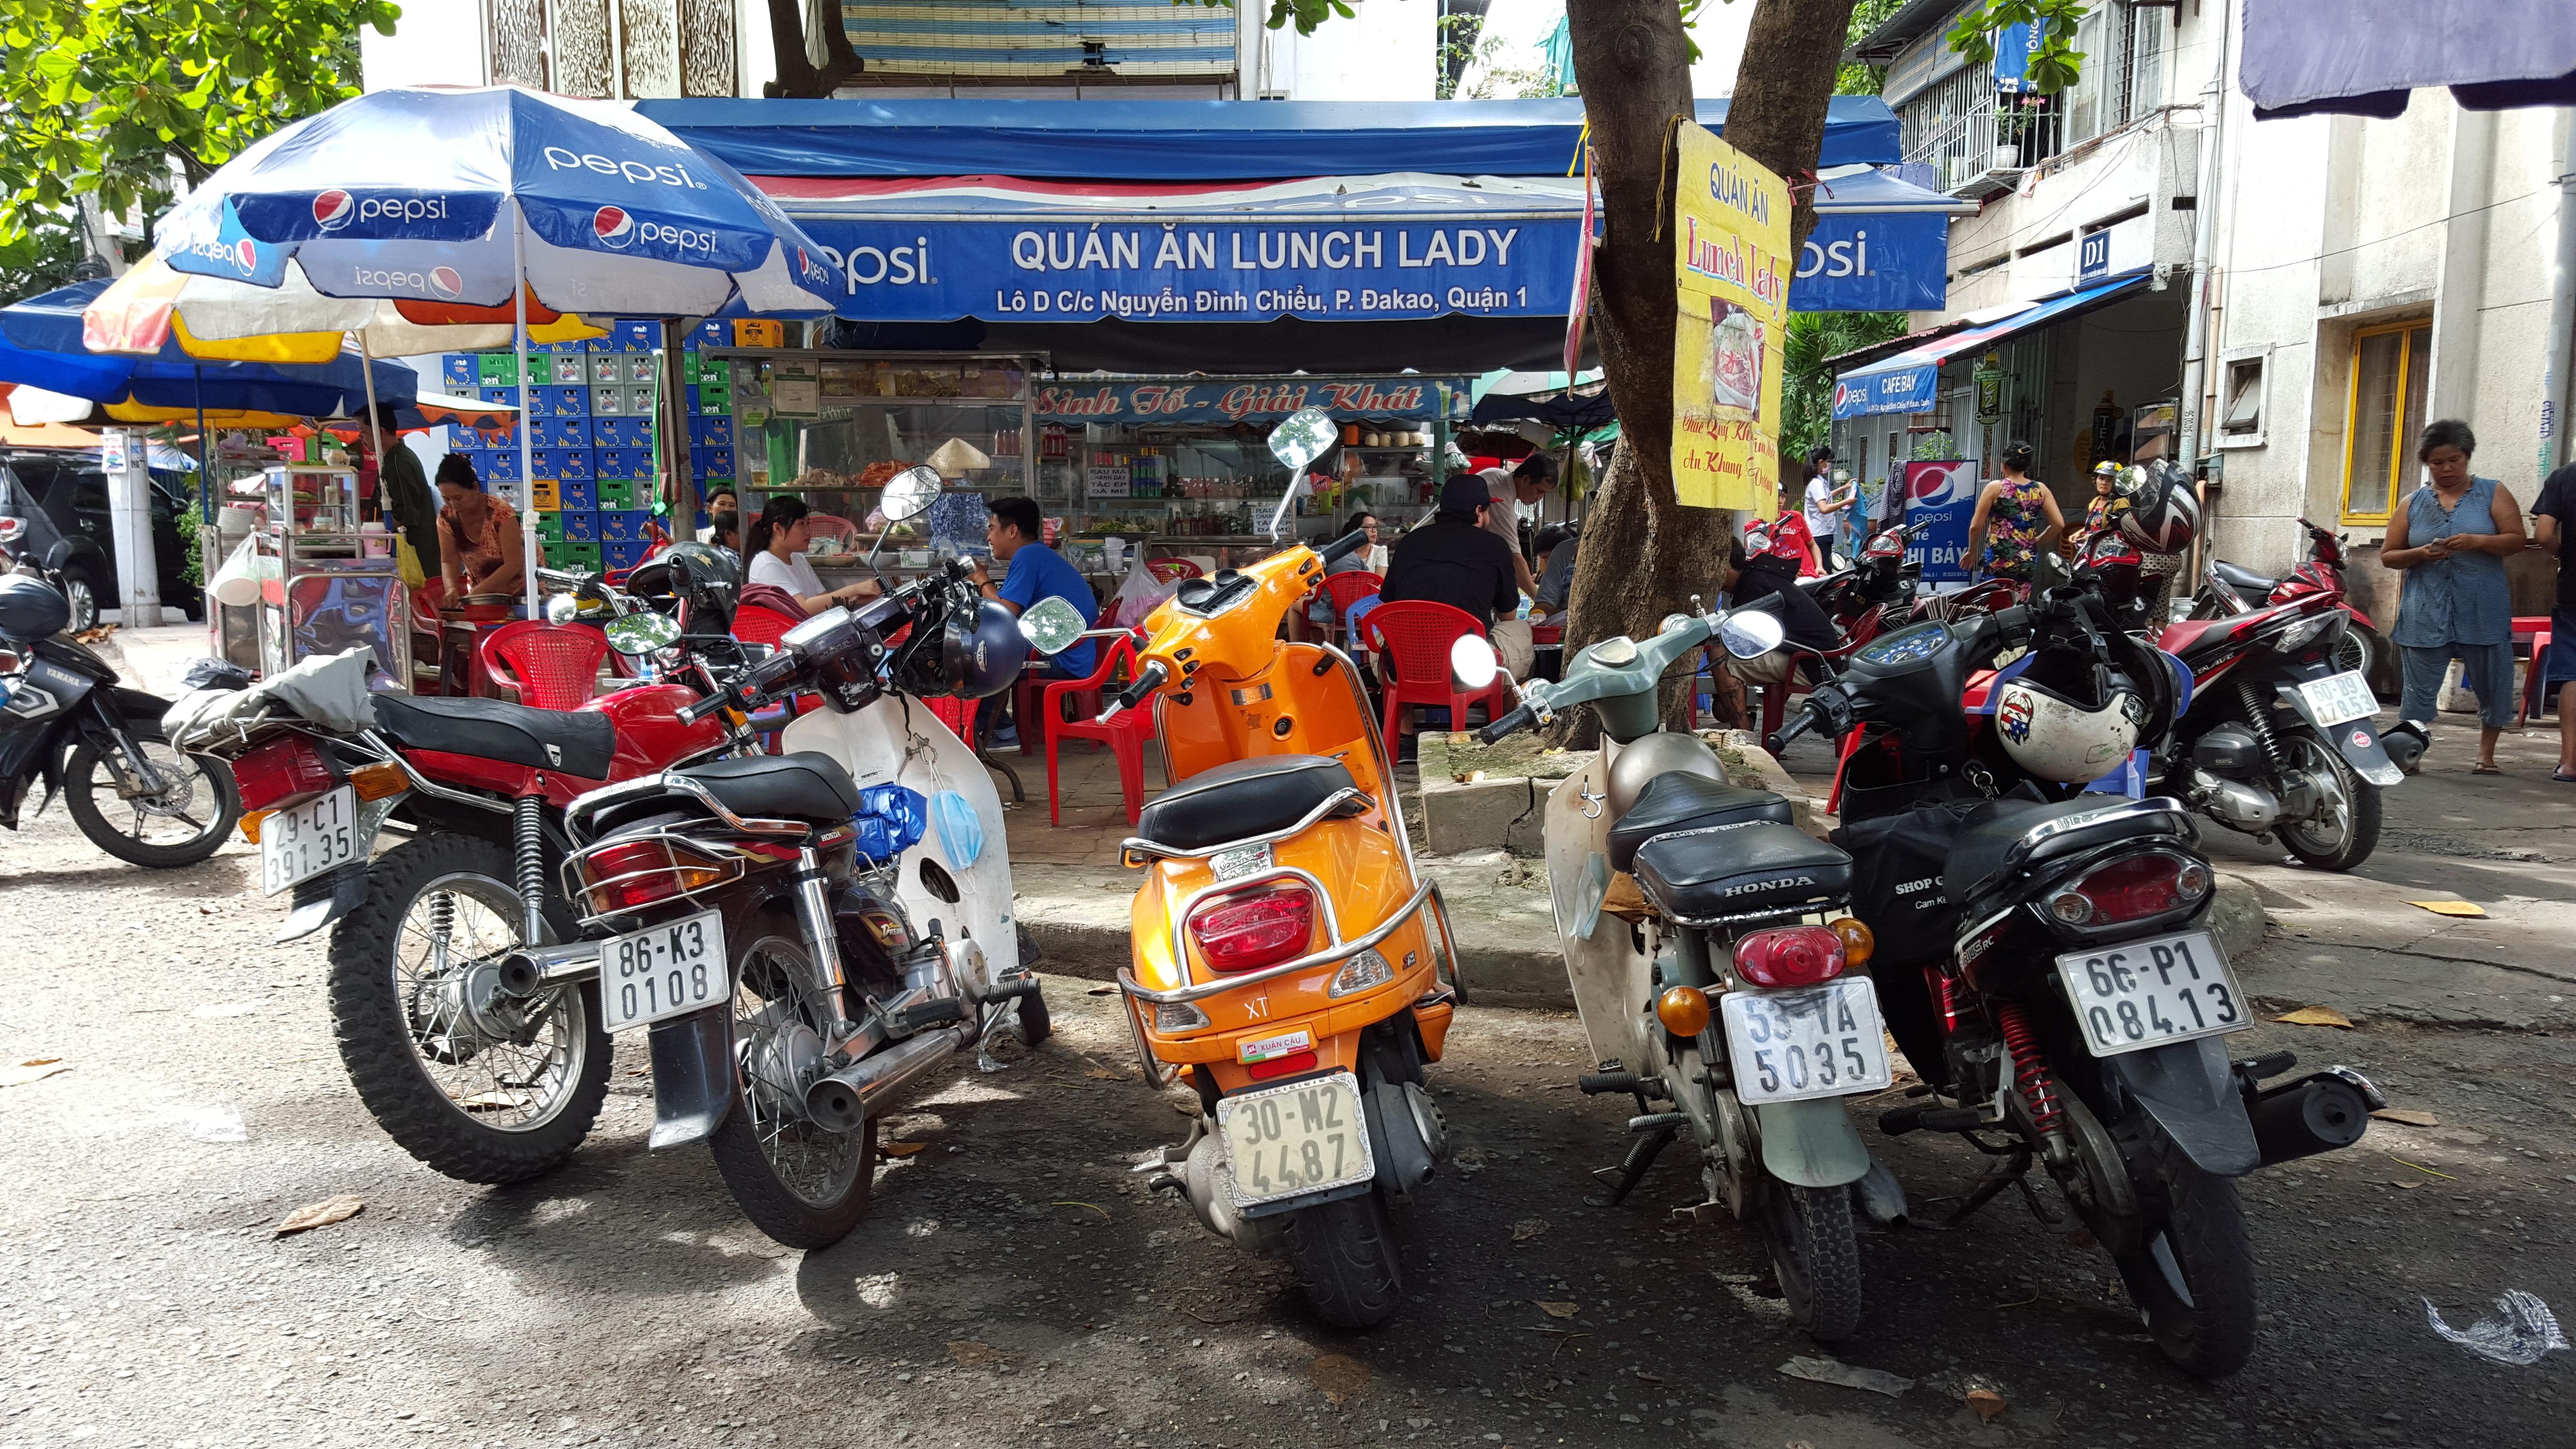 Teaching English in Vietnam - TEFL certification